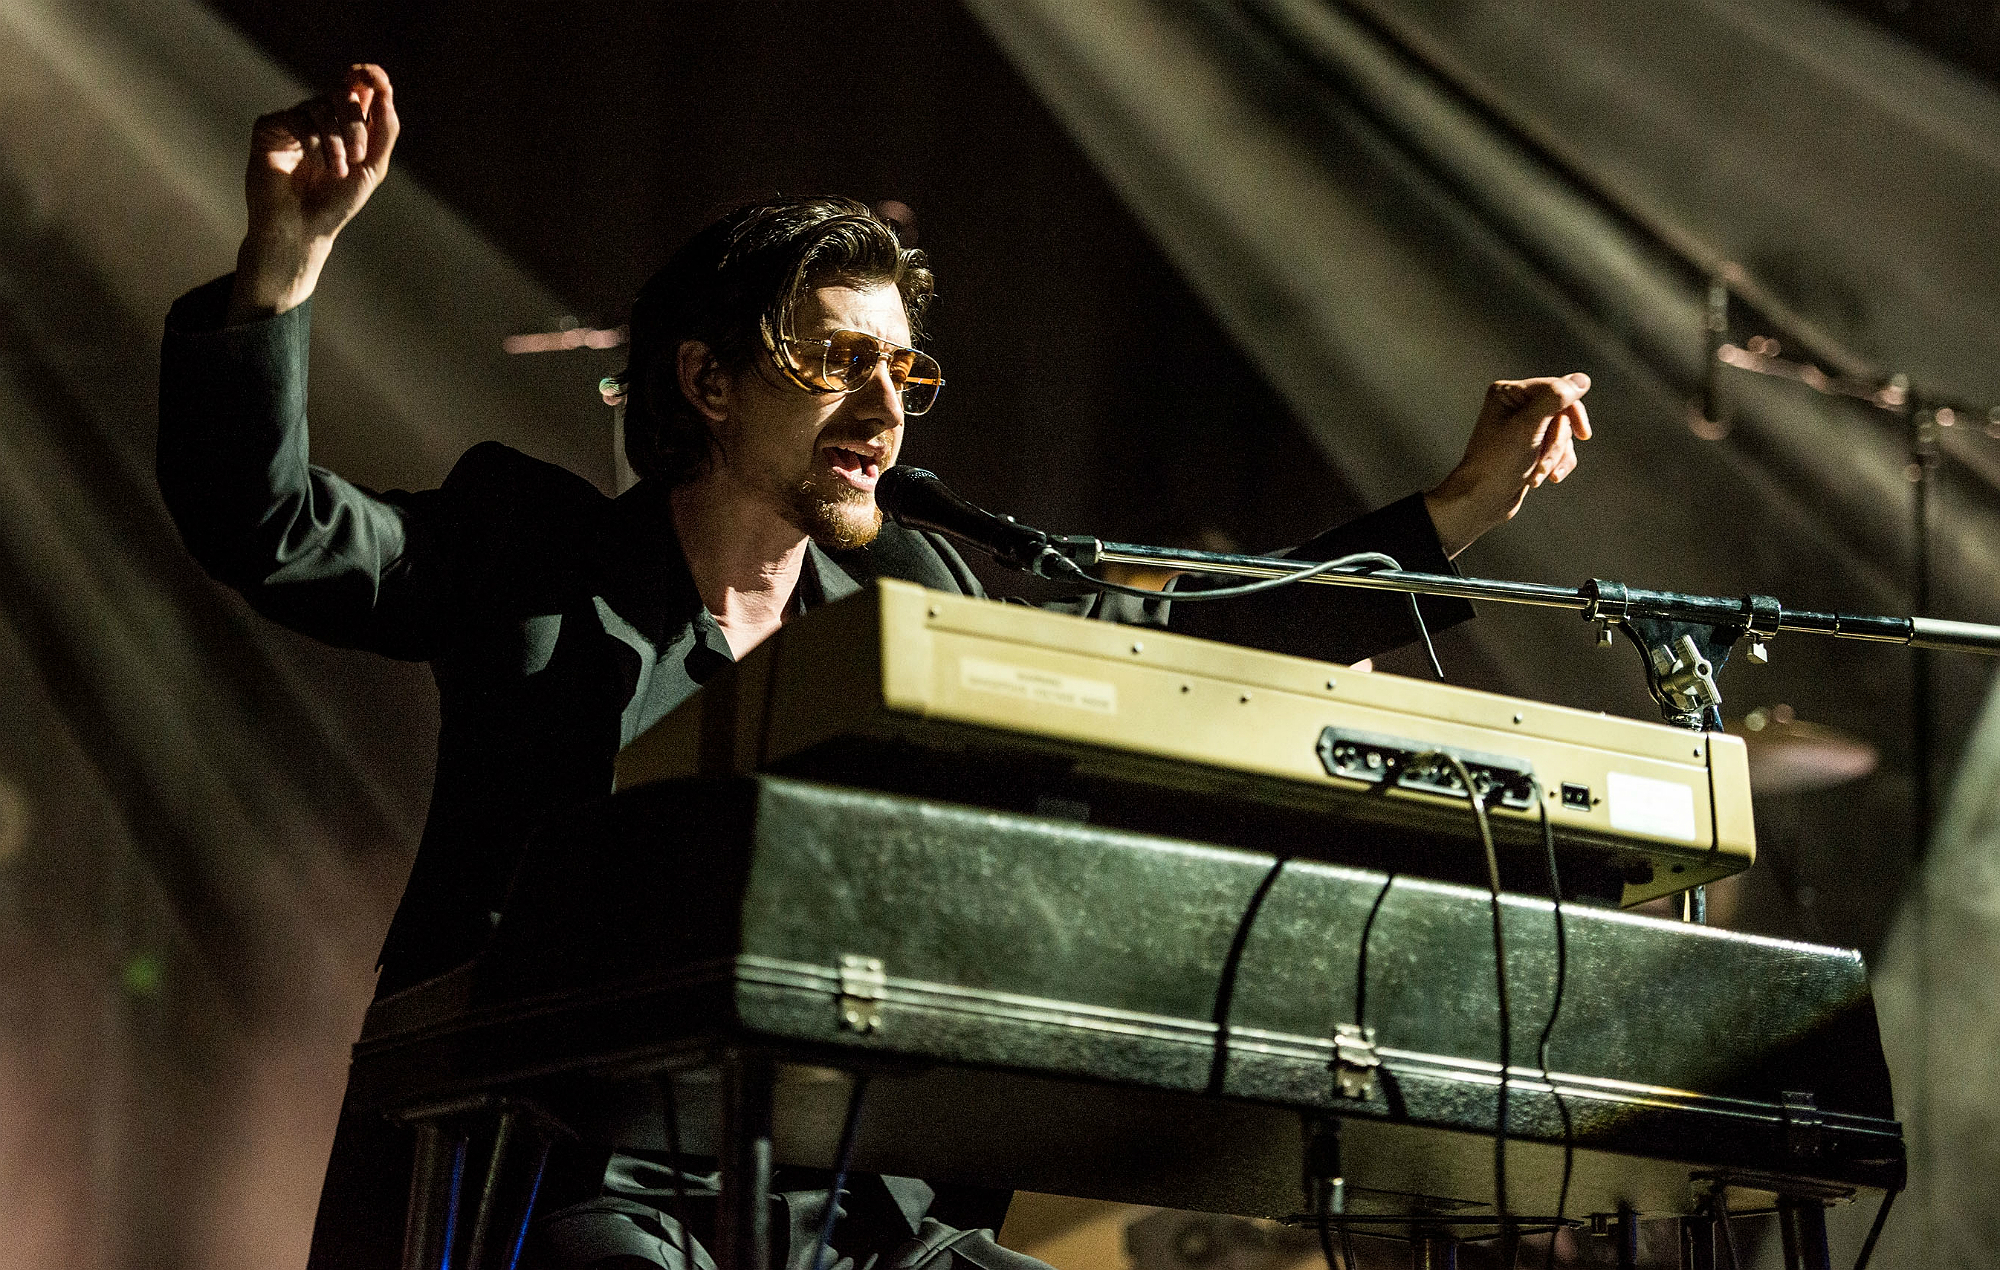 NME Festival blog: Odds slashed on Arctic Monkeys headlining Glastonbury 2019